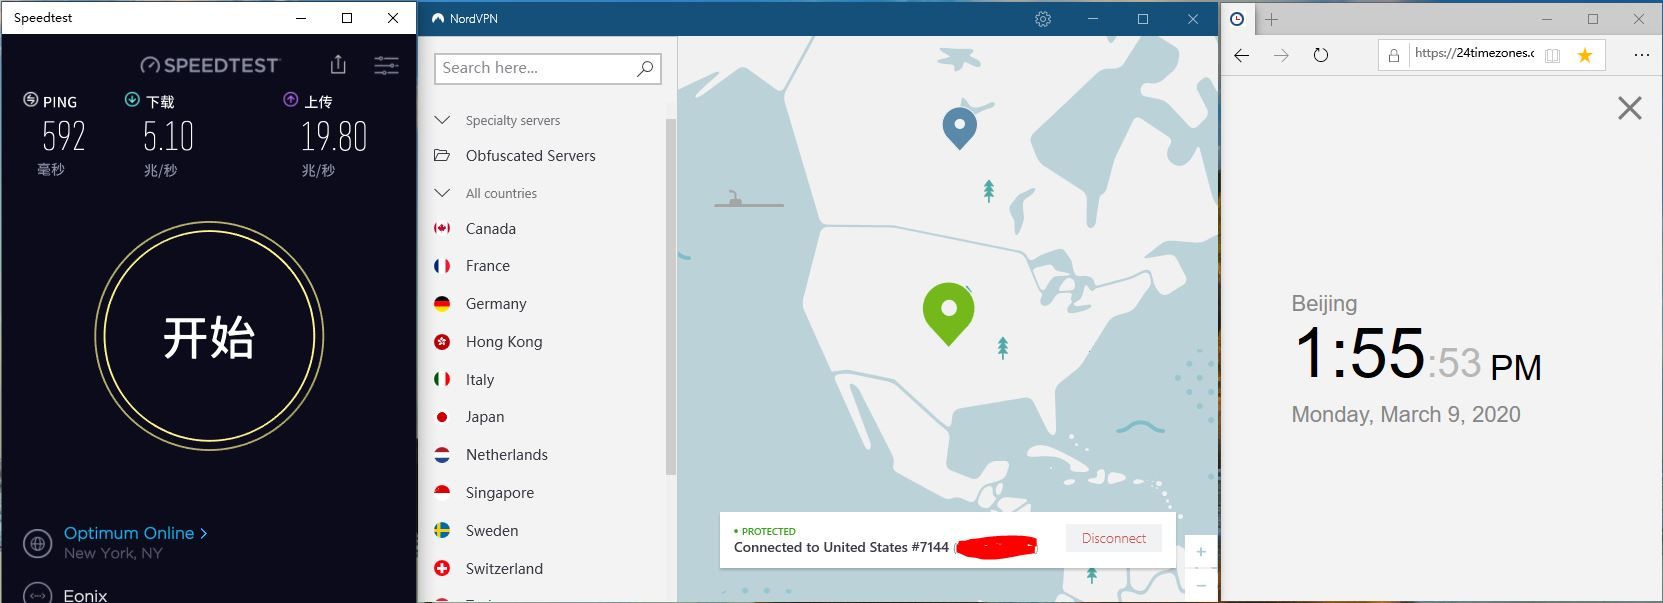 Windows10 NordVPN USA #7144 中国VPN翻墙 科学上网 SpeedTest测速 - 20200309